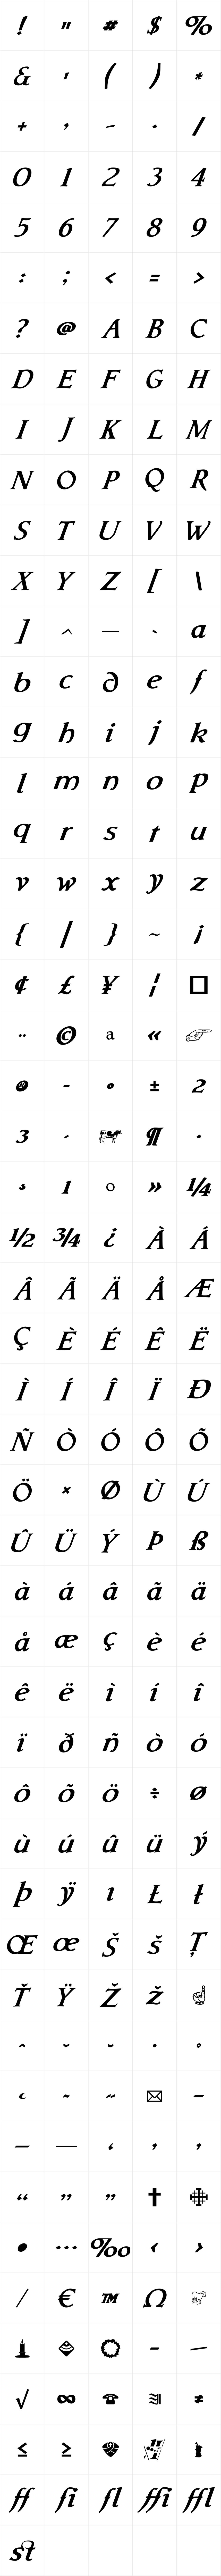 Librum BoldItalic